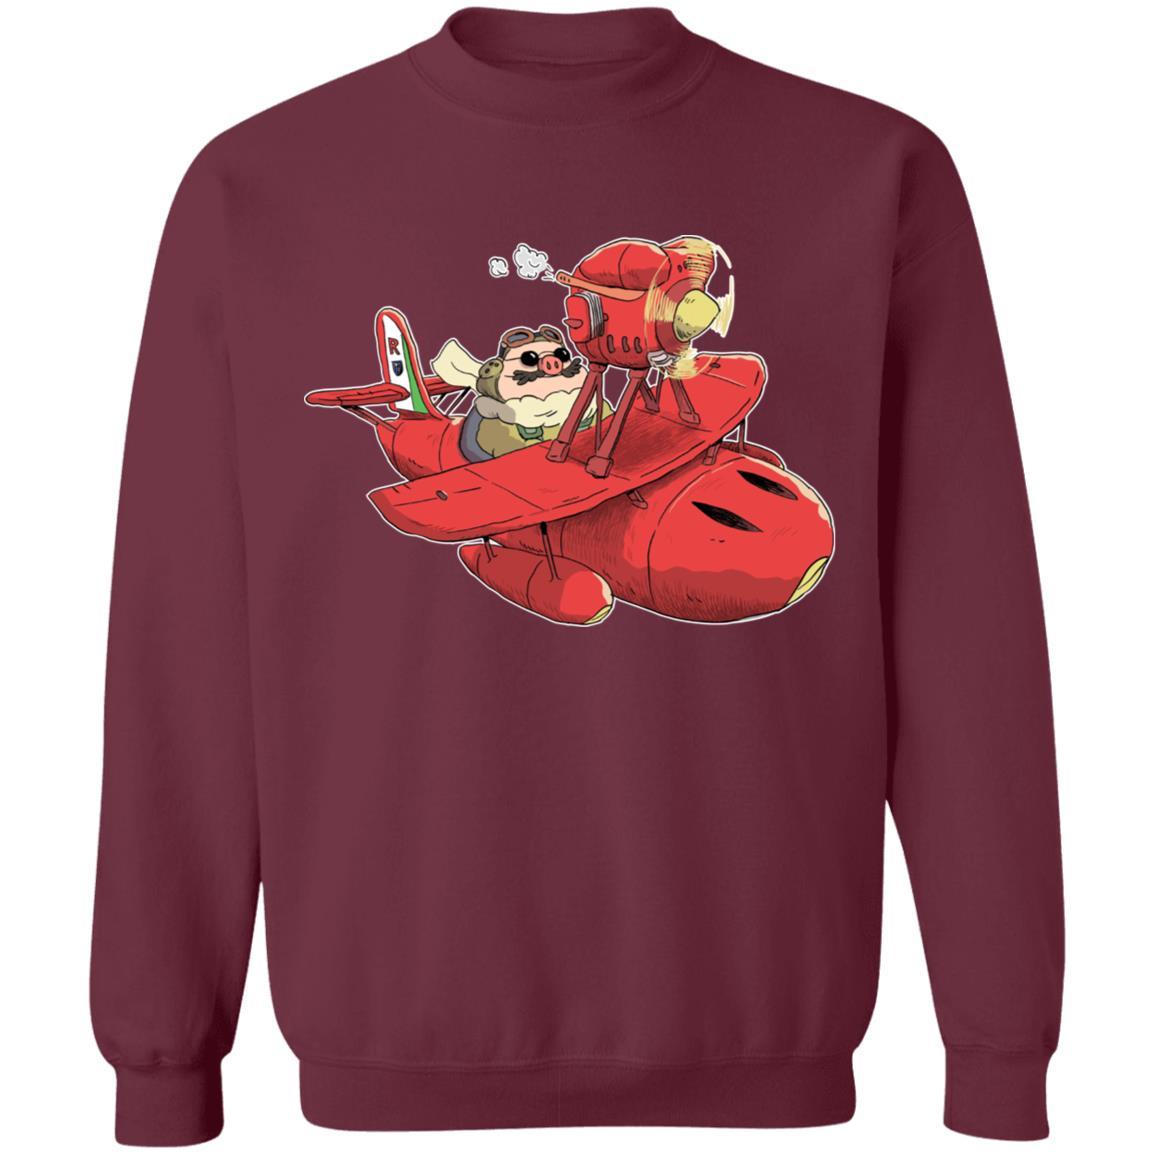 Porco Rosso Chibi Sweatshirt